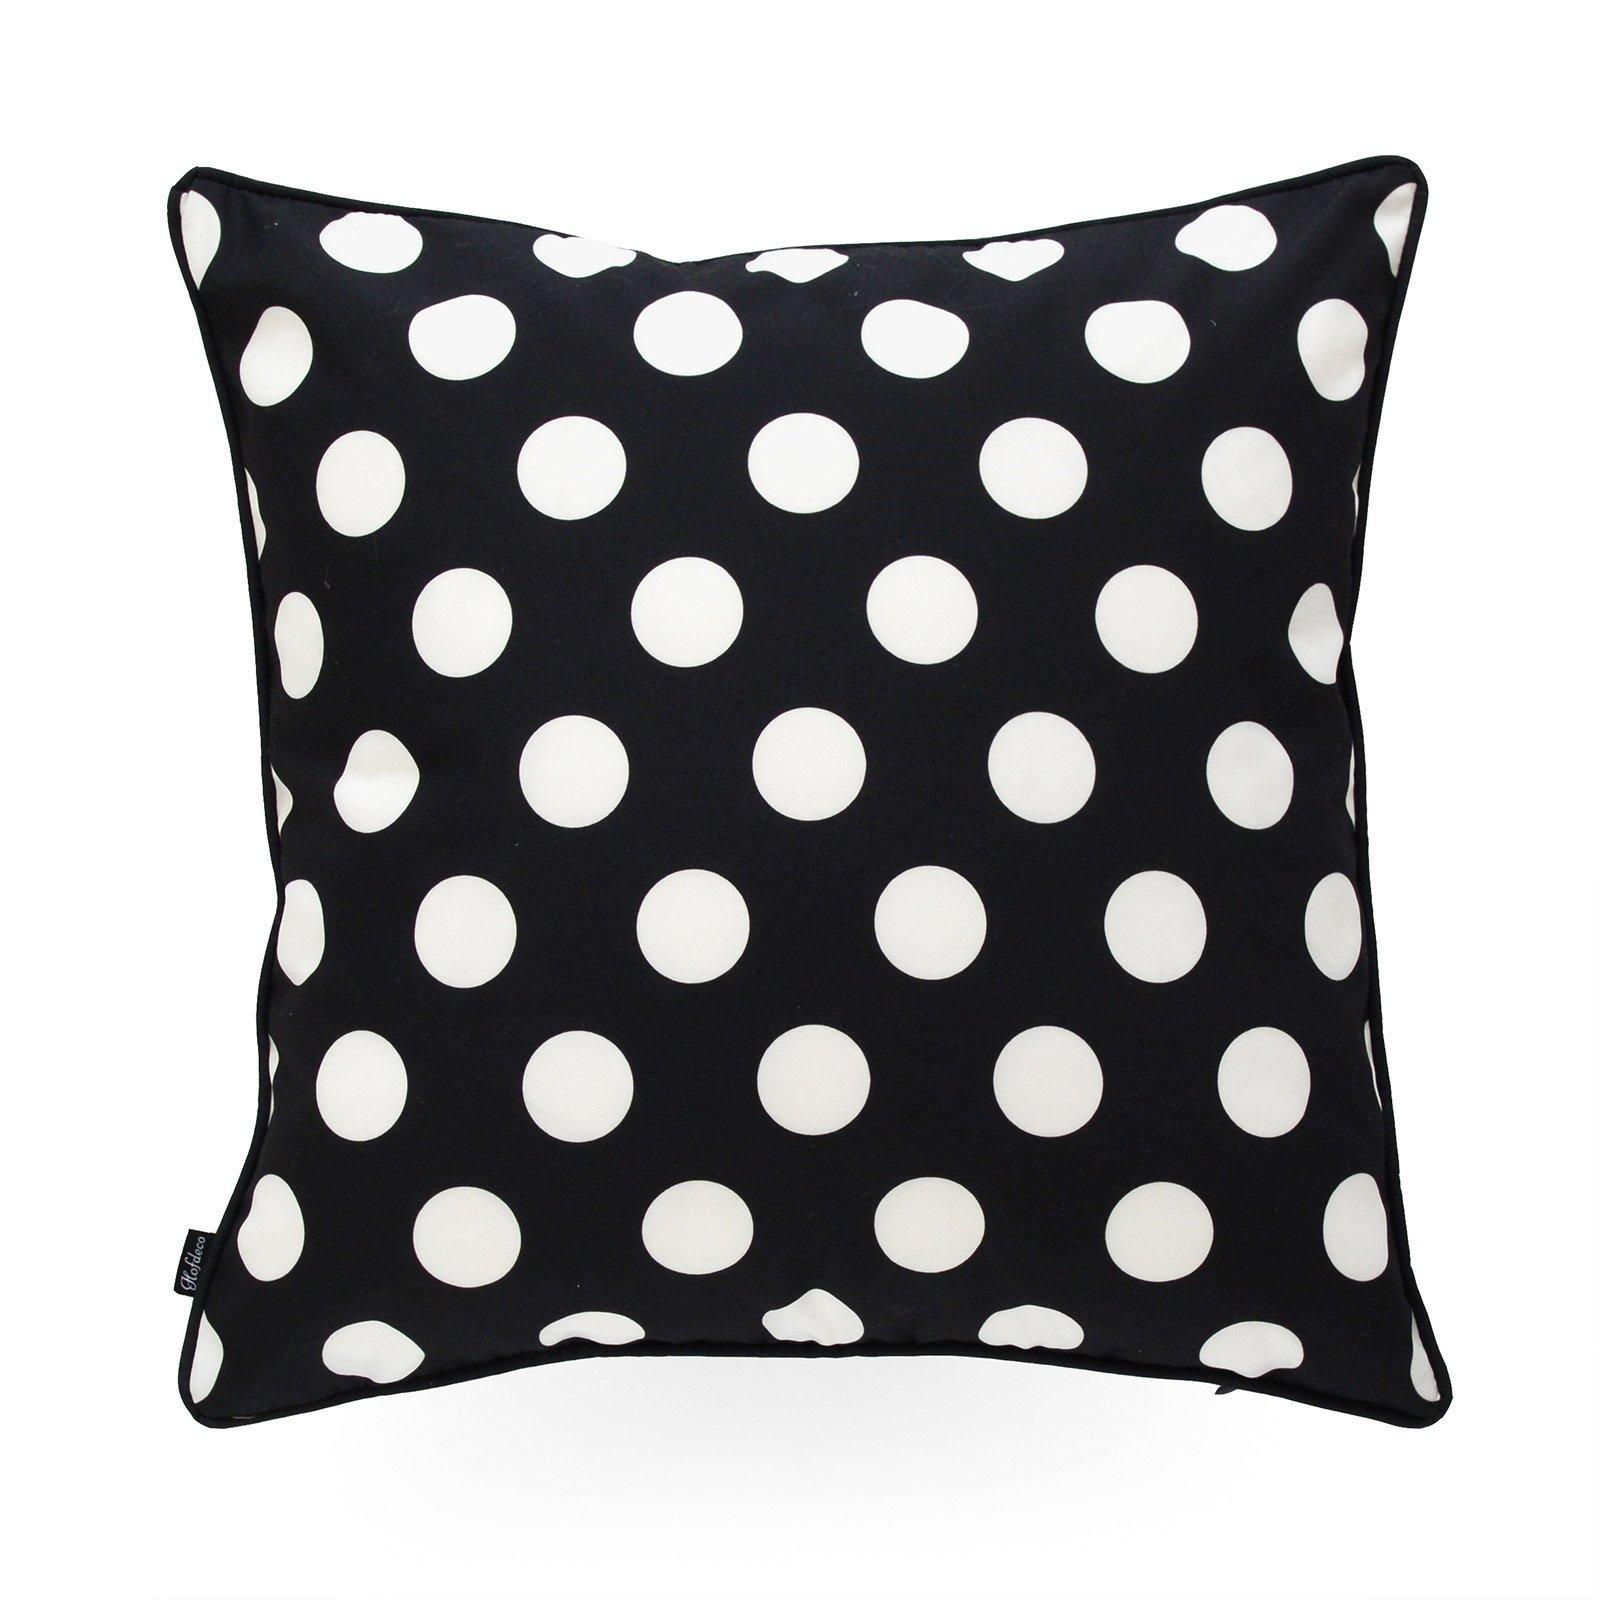 Hofdeco Decorative Throw Pillow Cover INDOOR OUTDOOR WATER RESISTANT Canvas Modern Black Dots 18''x18''